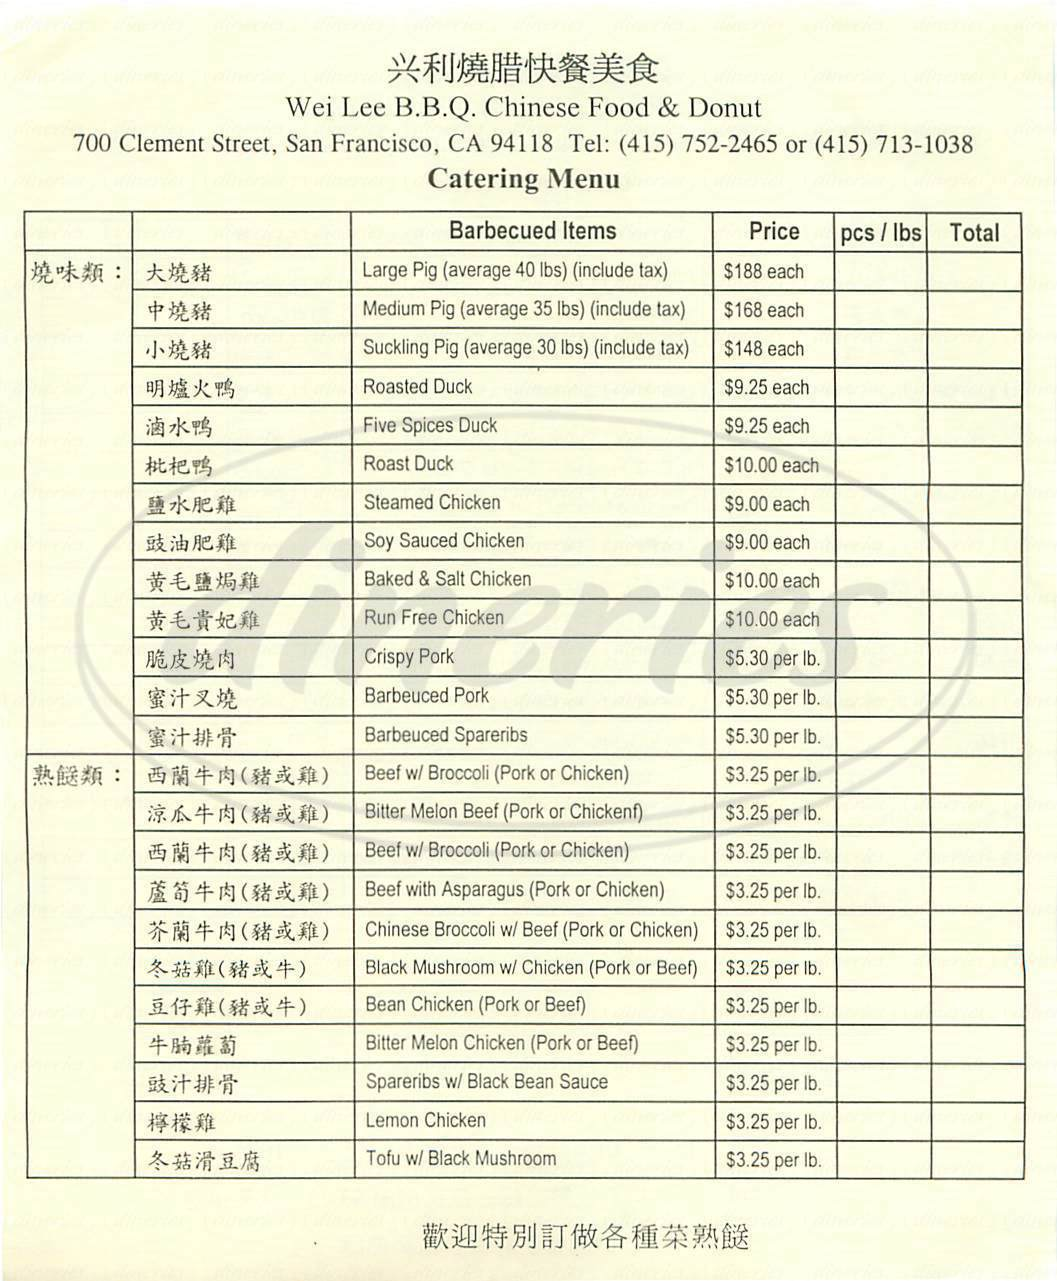 menu for Wei Lee BBQ